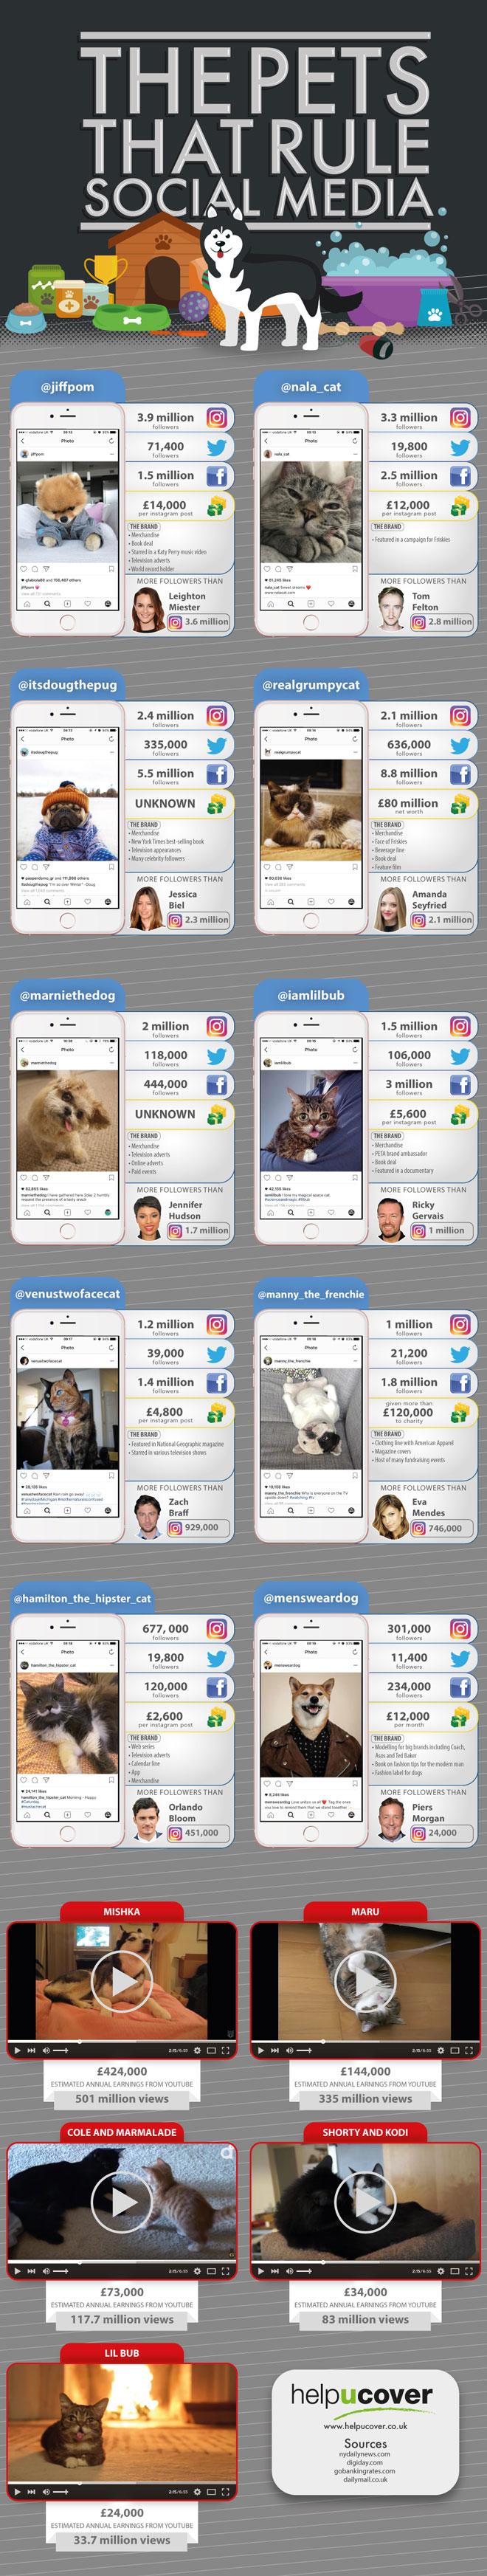 Top 10 Apps for Instant Messaging Infographic  Entrepreneur